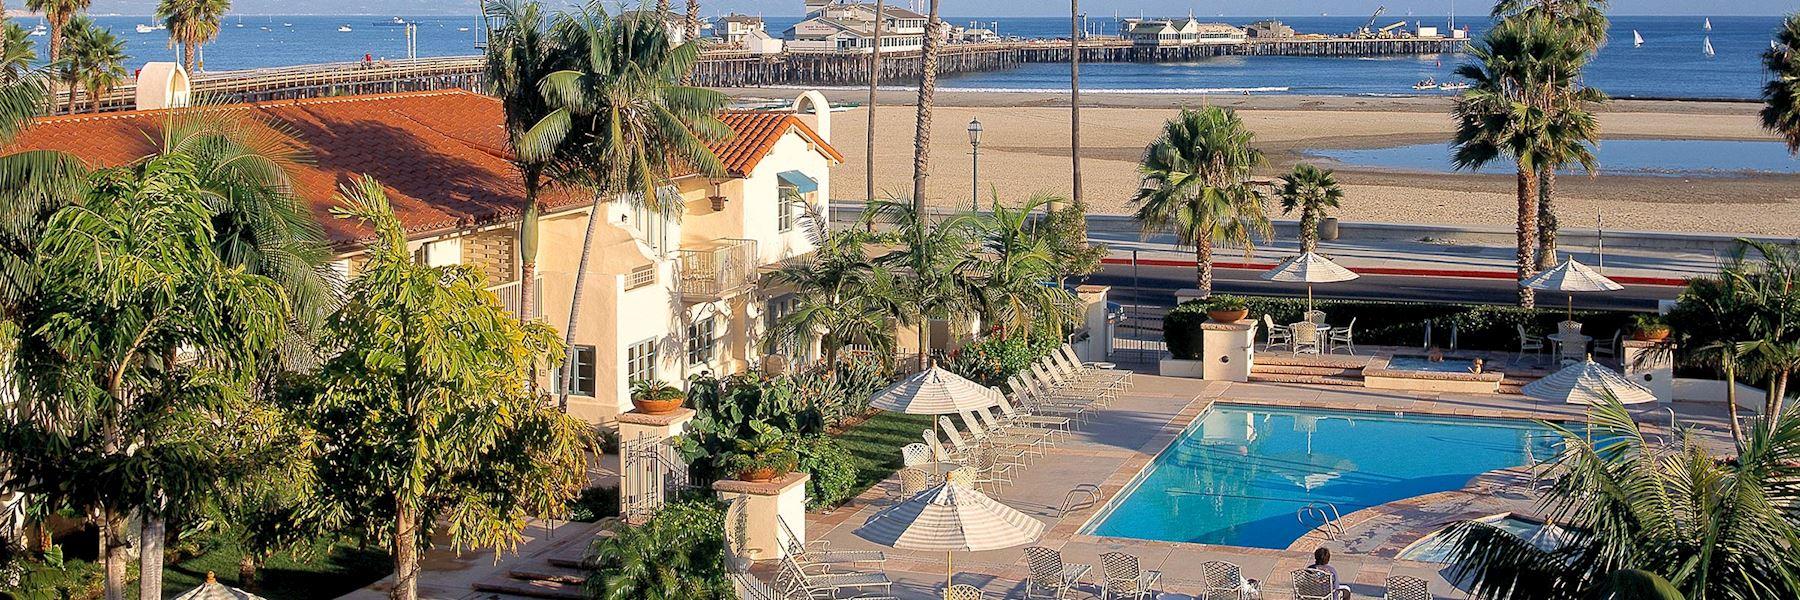 Harbor View Inn | Hotels in Santa Barbara | Audley Travel